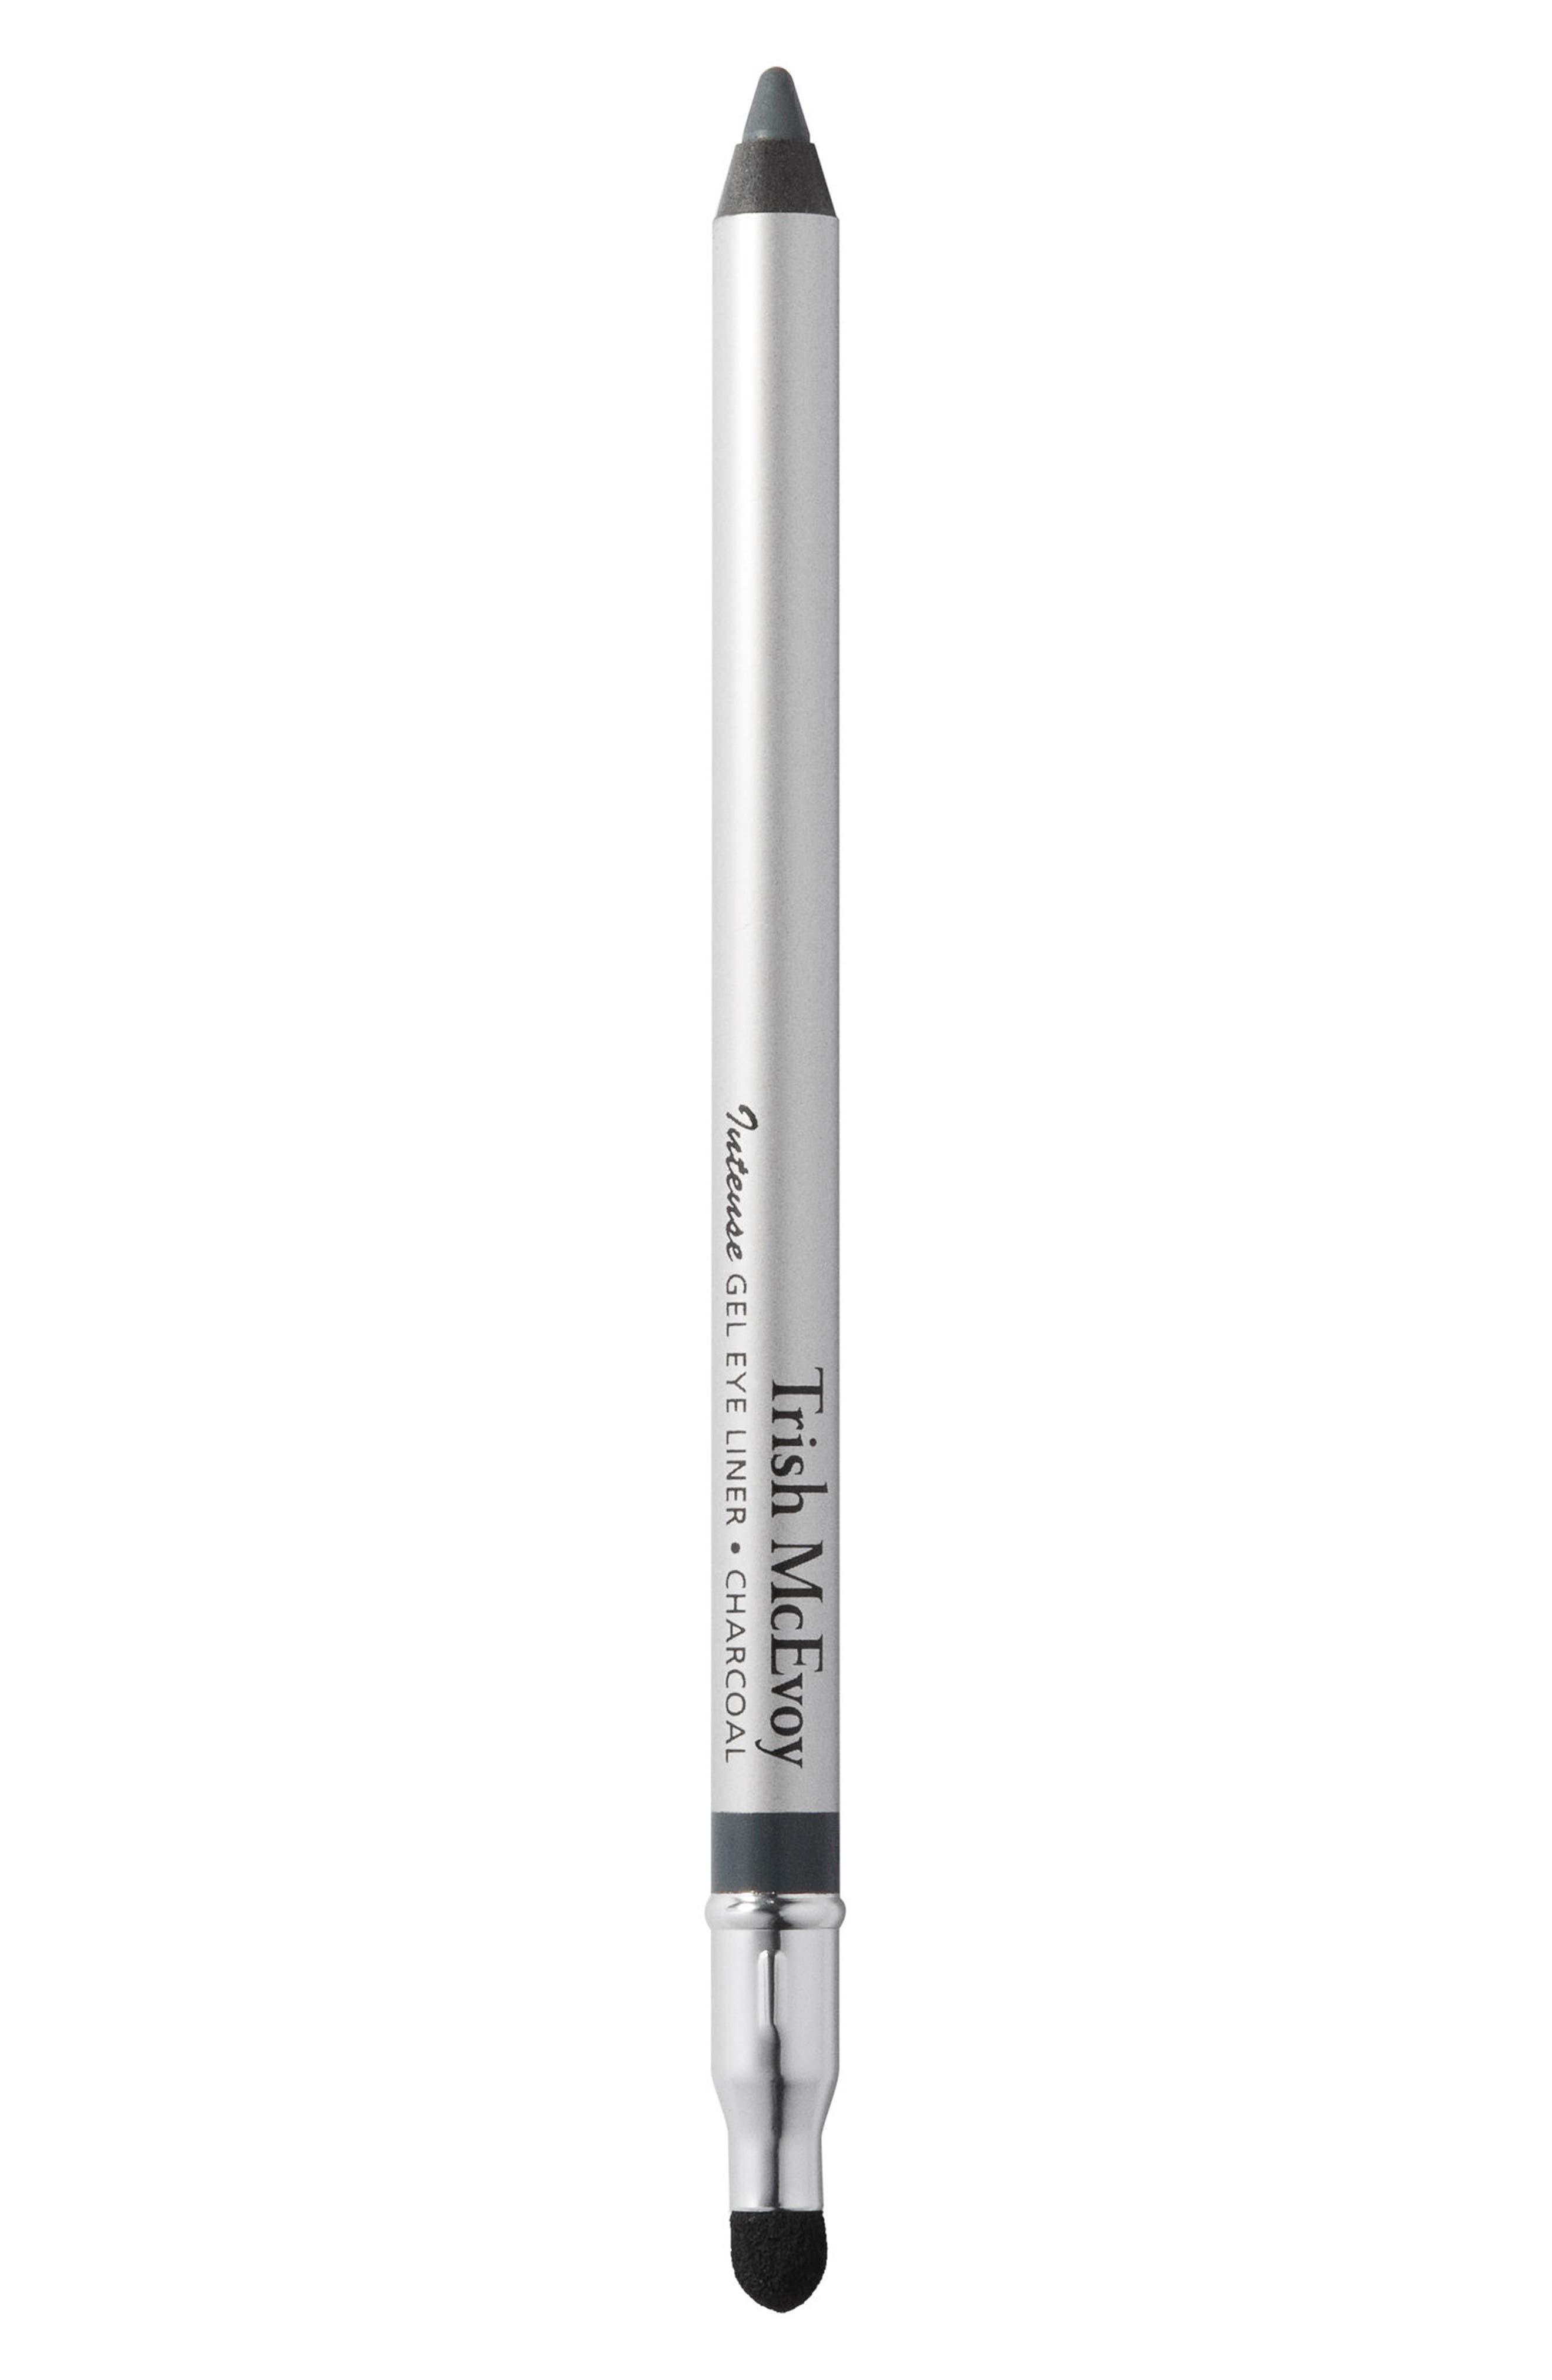 Trish McEvoy 'Intense' Gel Eyeliner Pencil